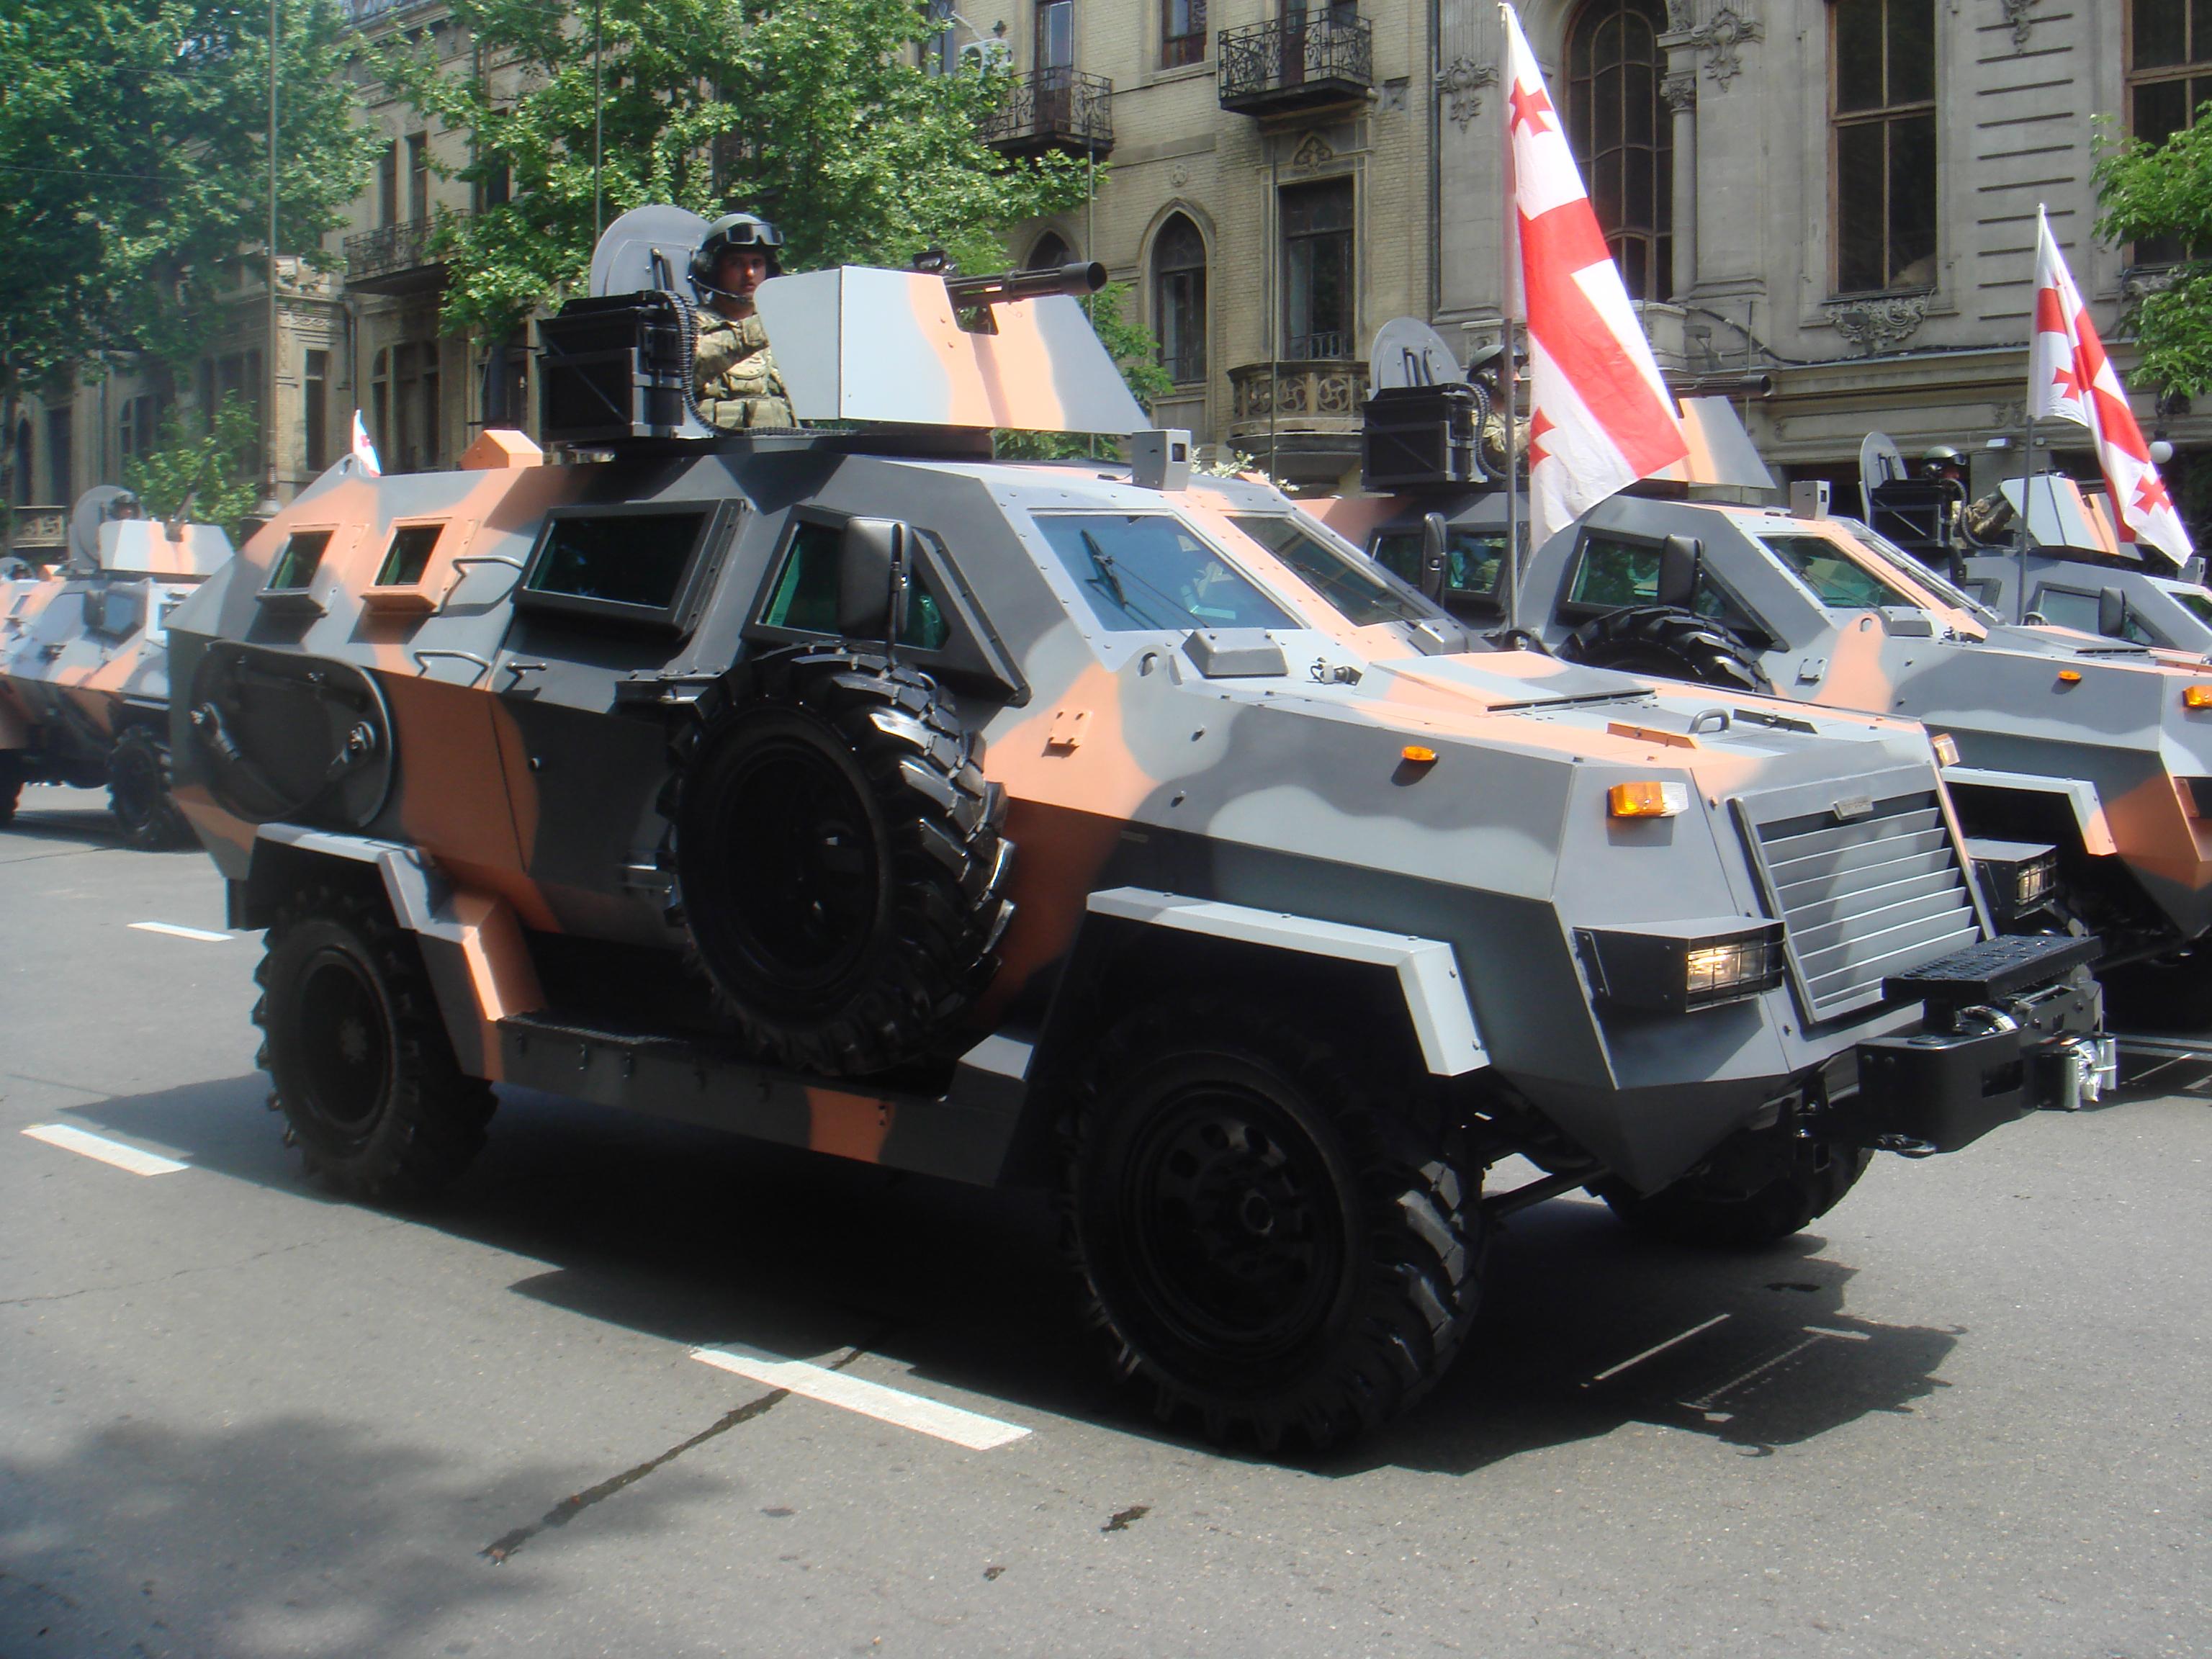 vehiculo ocelote DidgoriAPCsmallversion